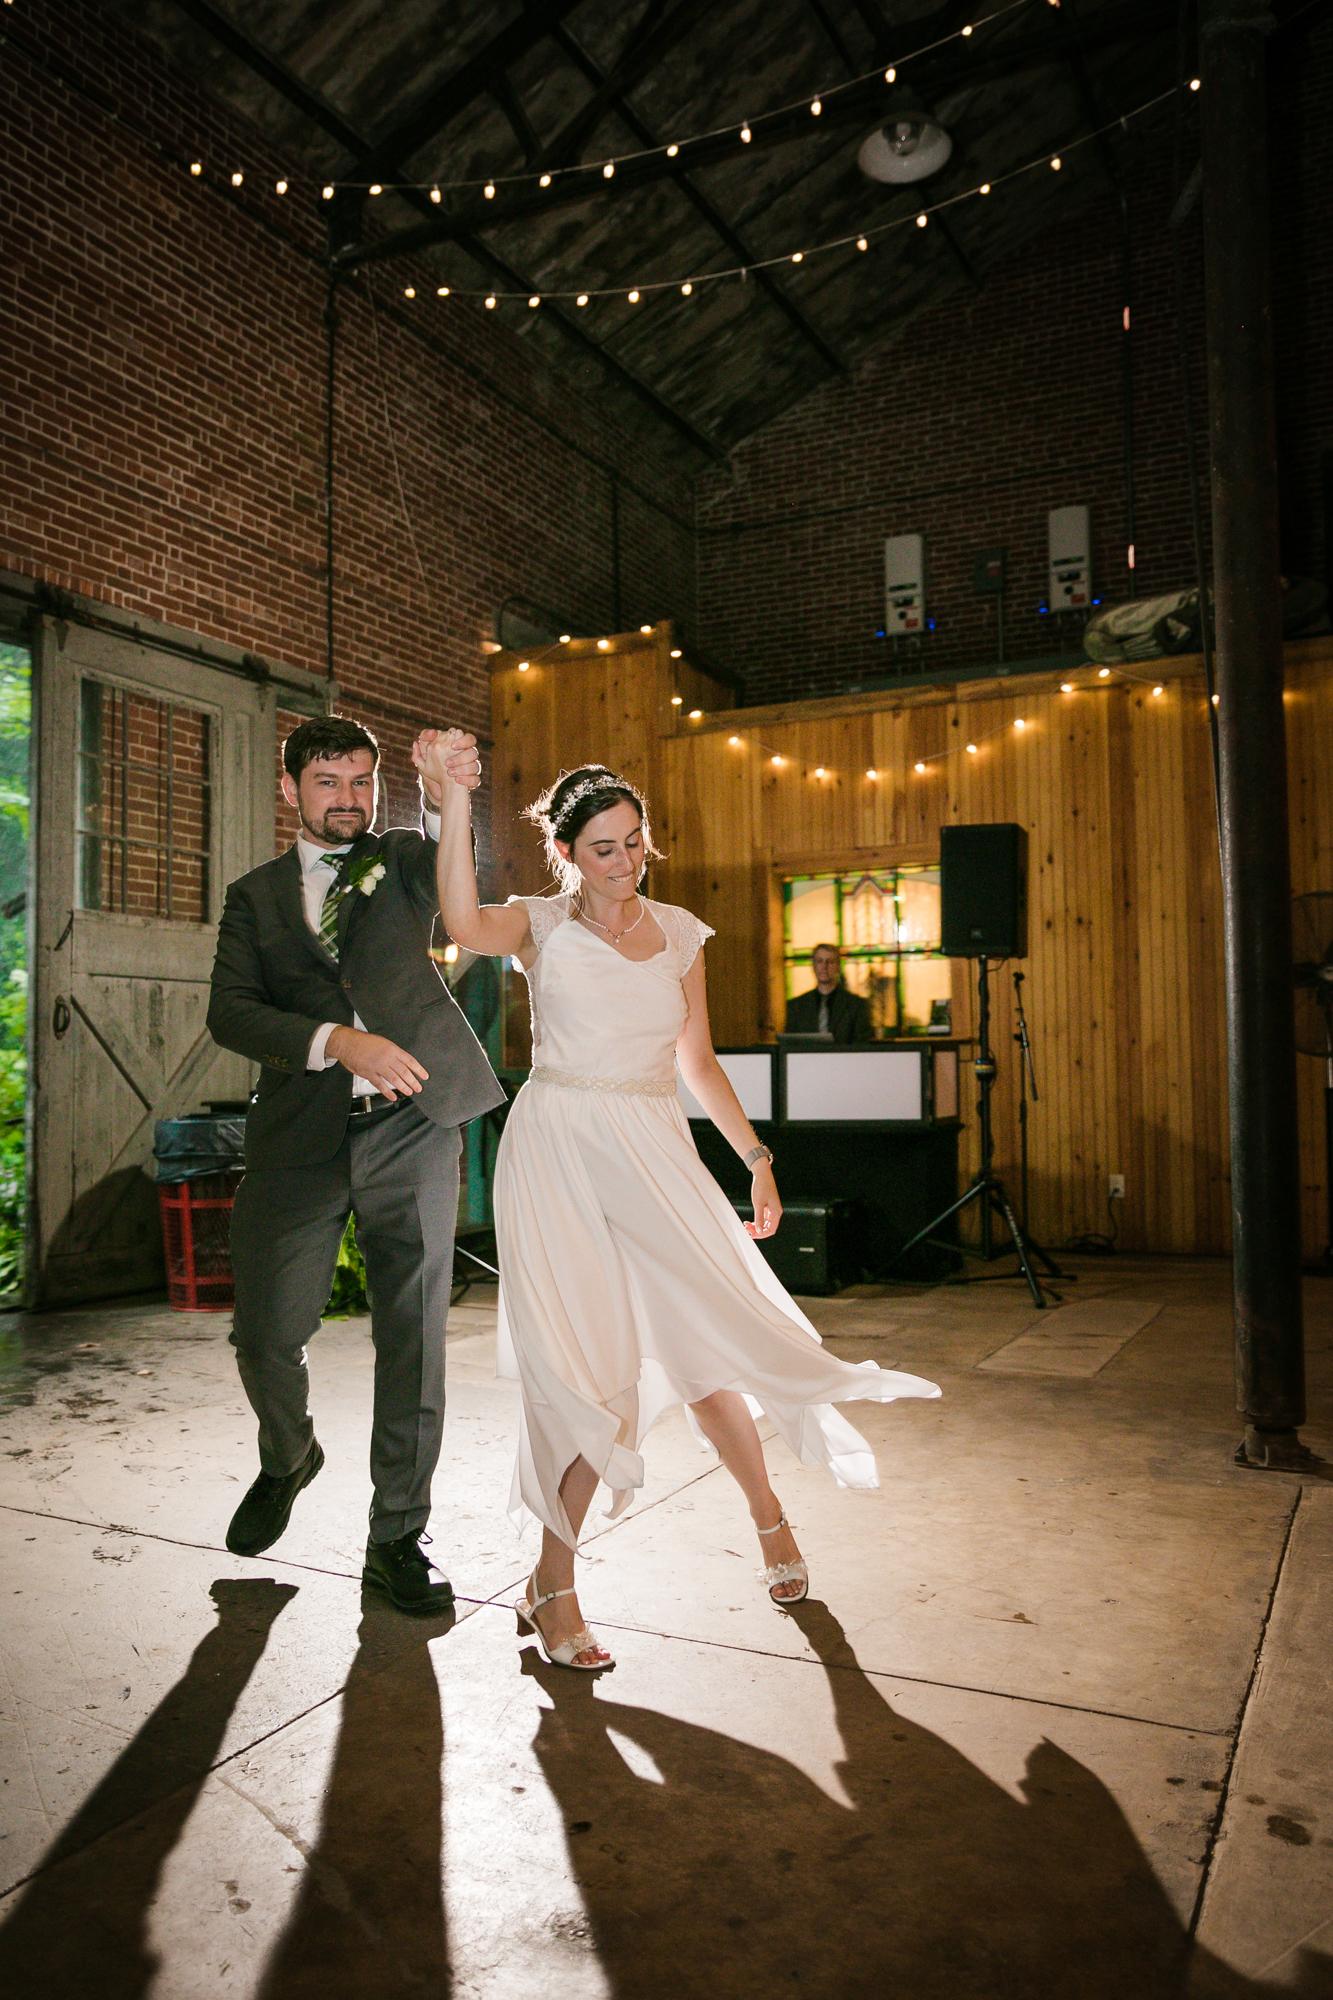 BETH AND MIKE - THE PUMP HOUSE - WEDDING PHOTOS-612.jpg